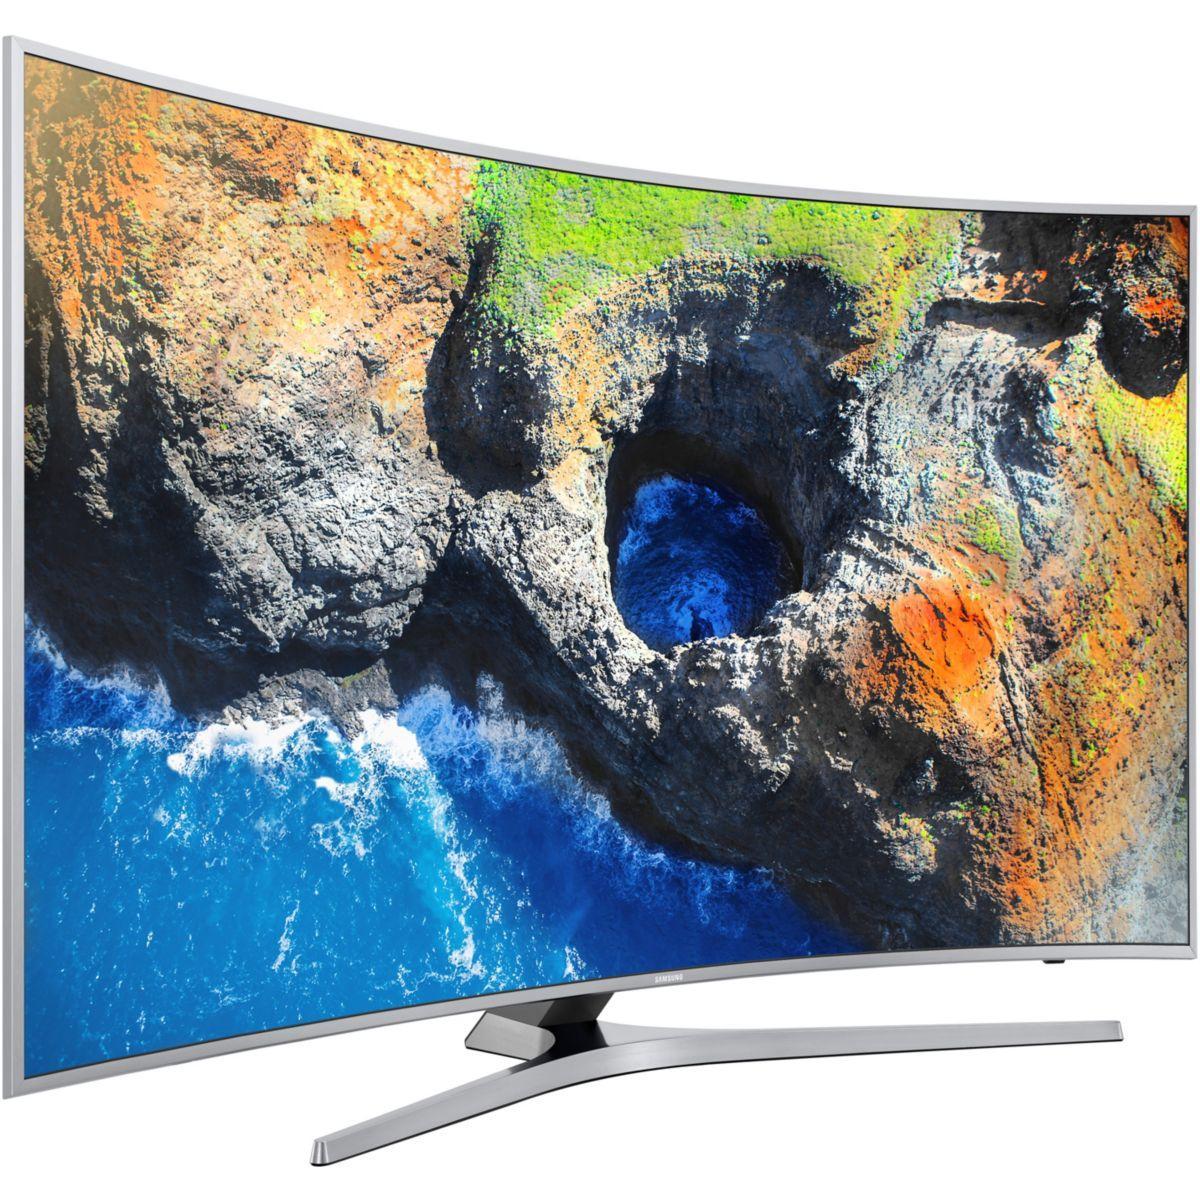 Tv samsung ue55mu6505 4k hdr incurve sma - 5% de remise immédiate avec le code : cool5 (photo)